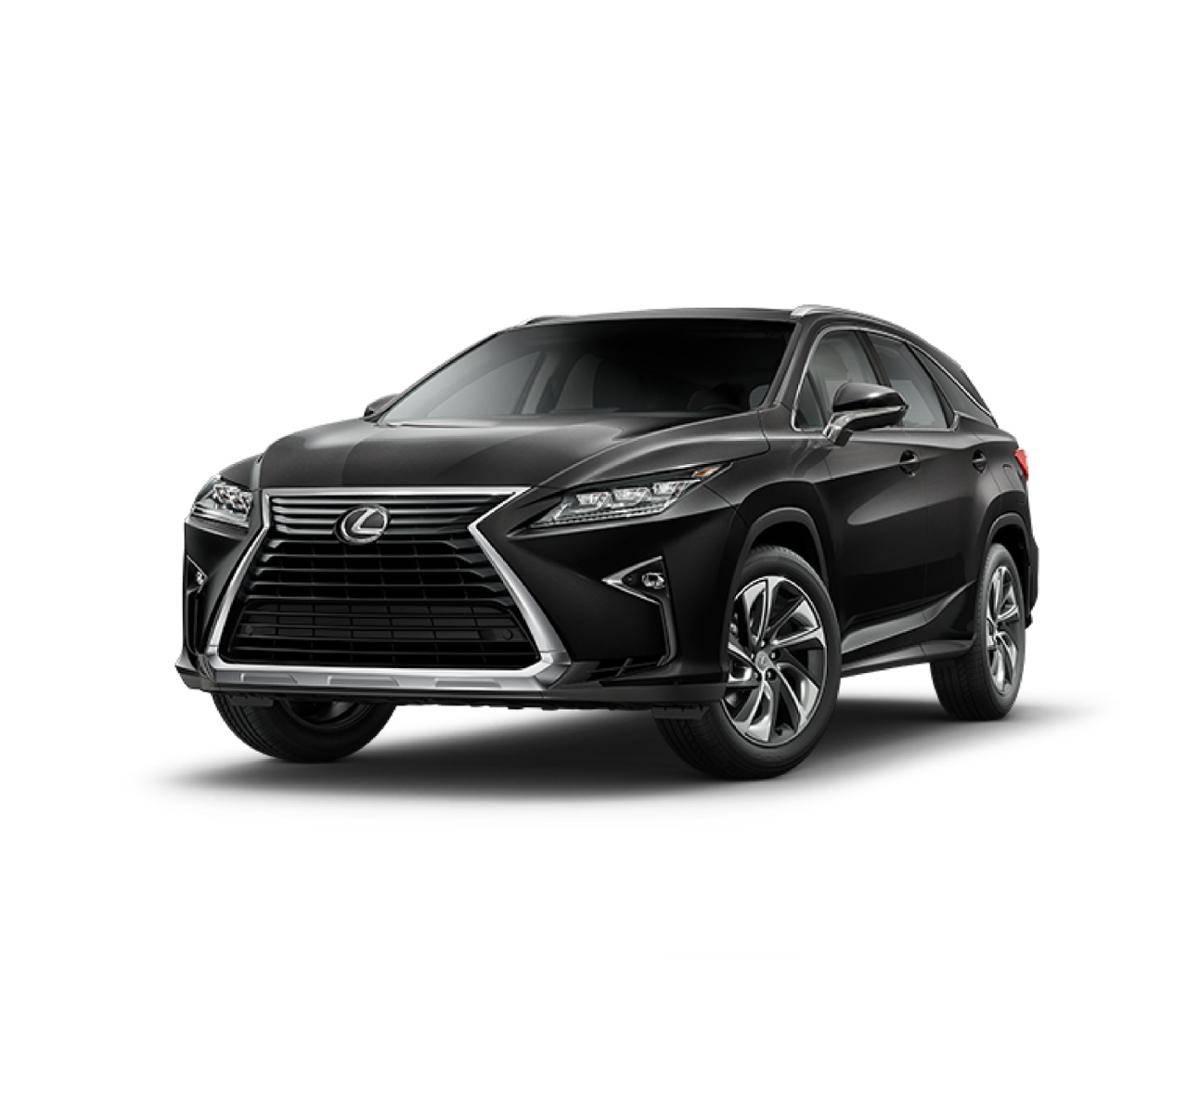 New 2018 Lexus RX